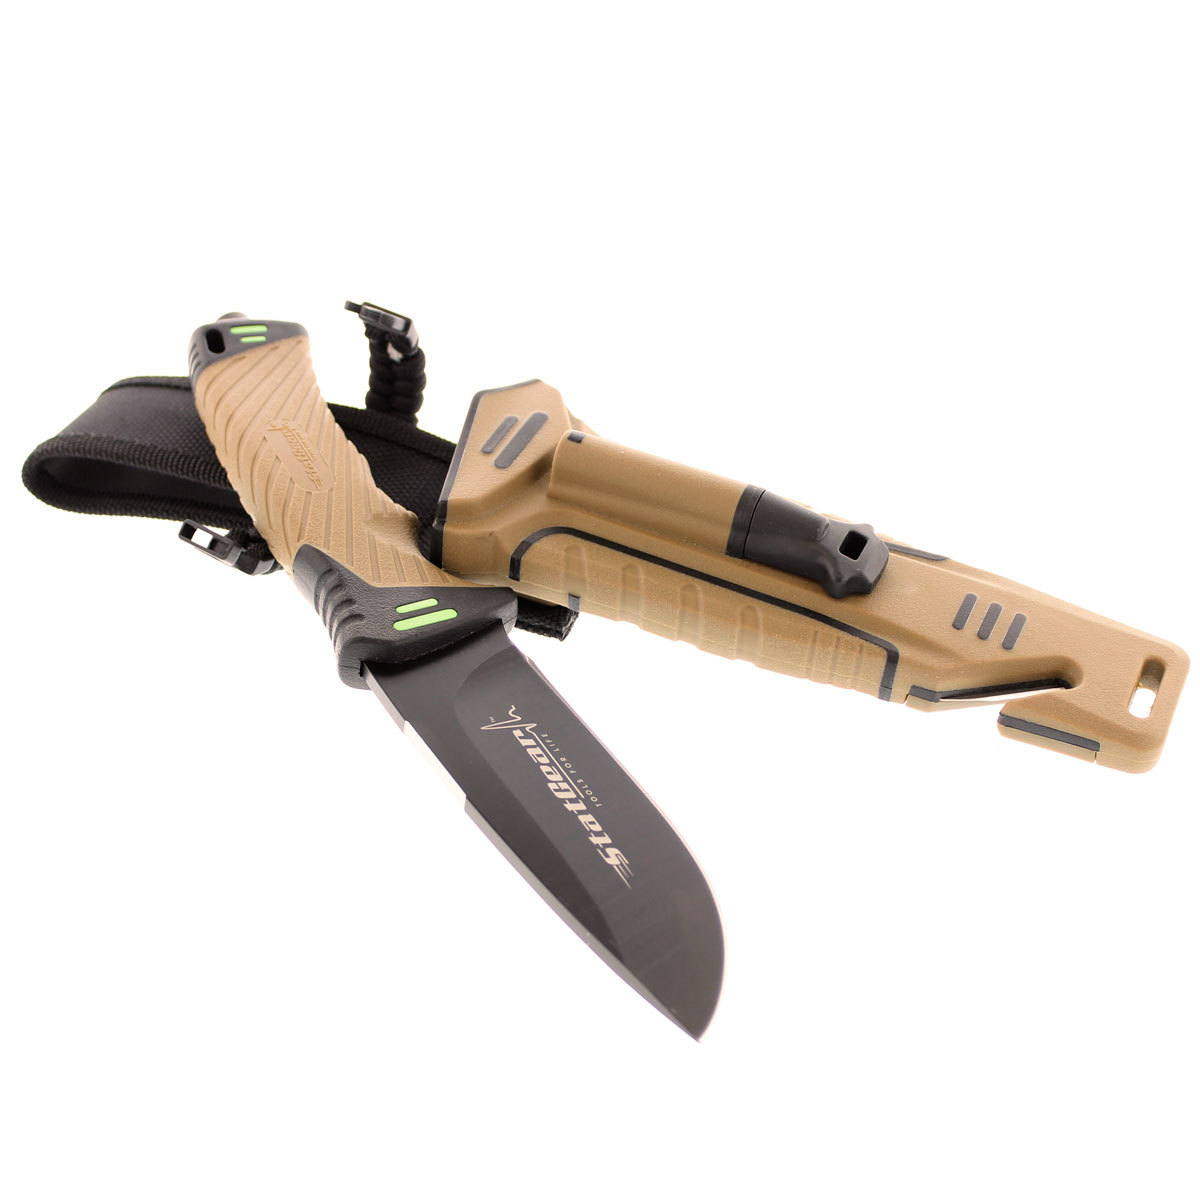 A Statgear survival knife